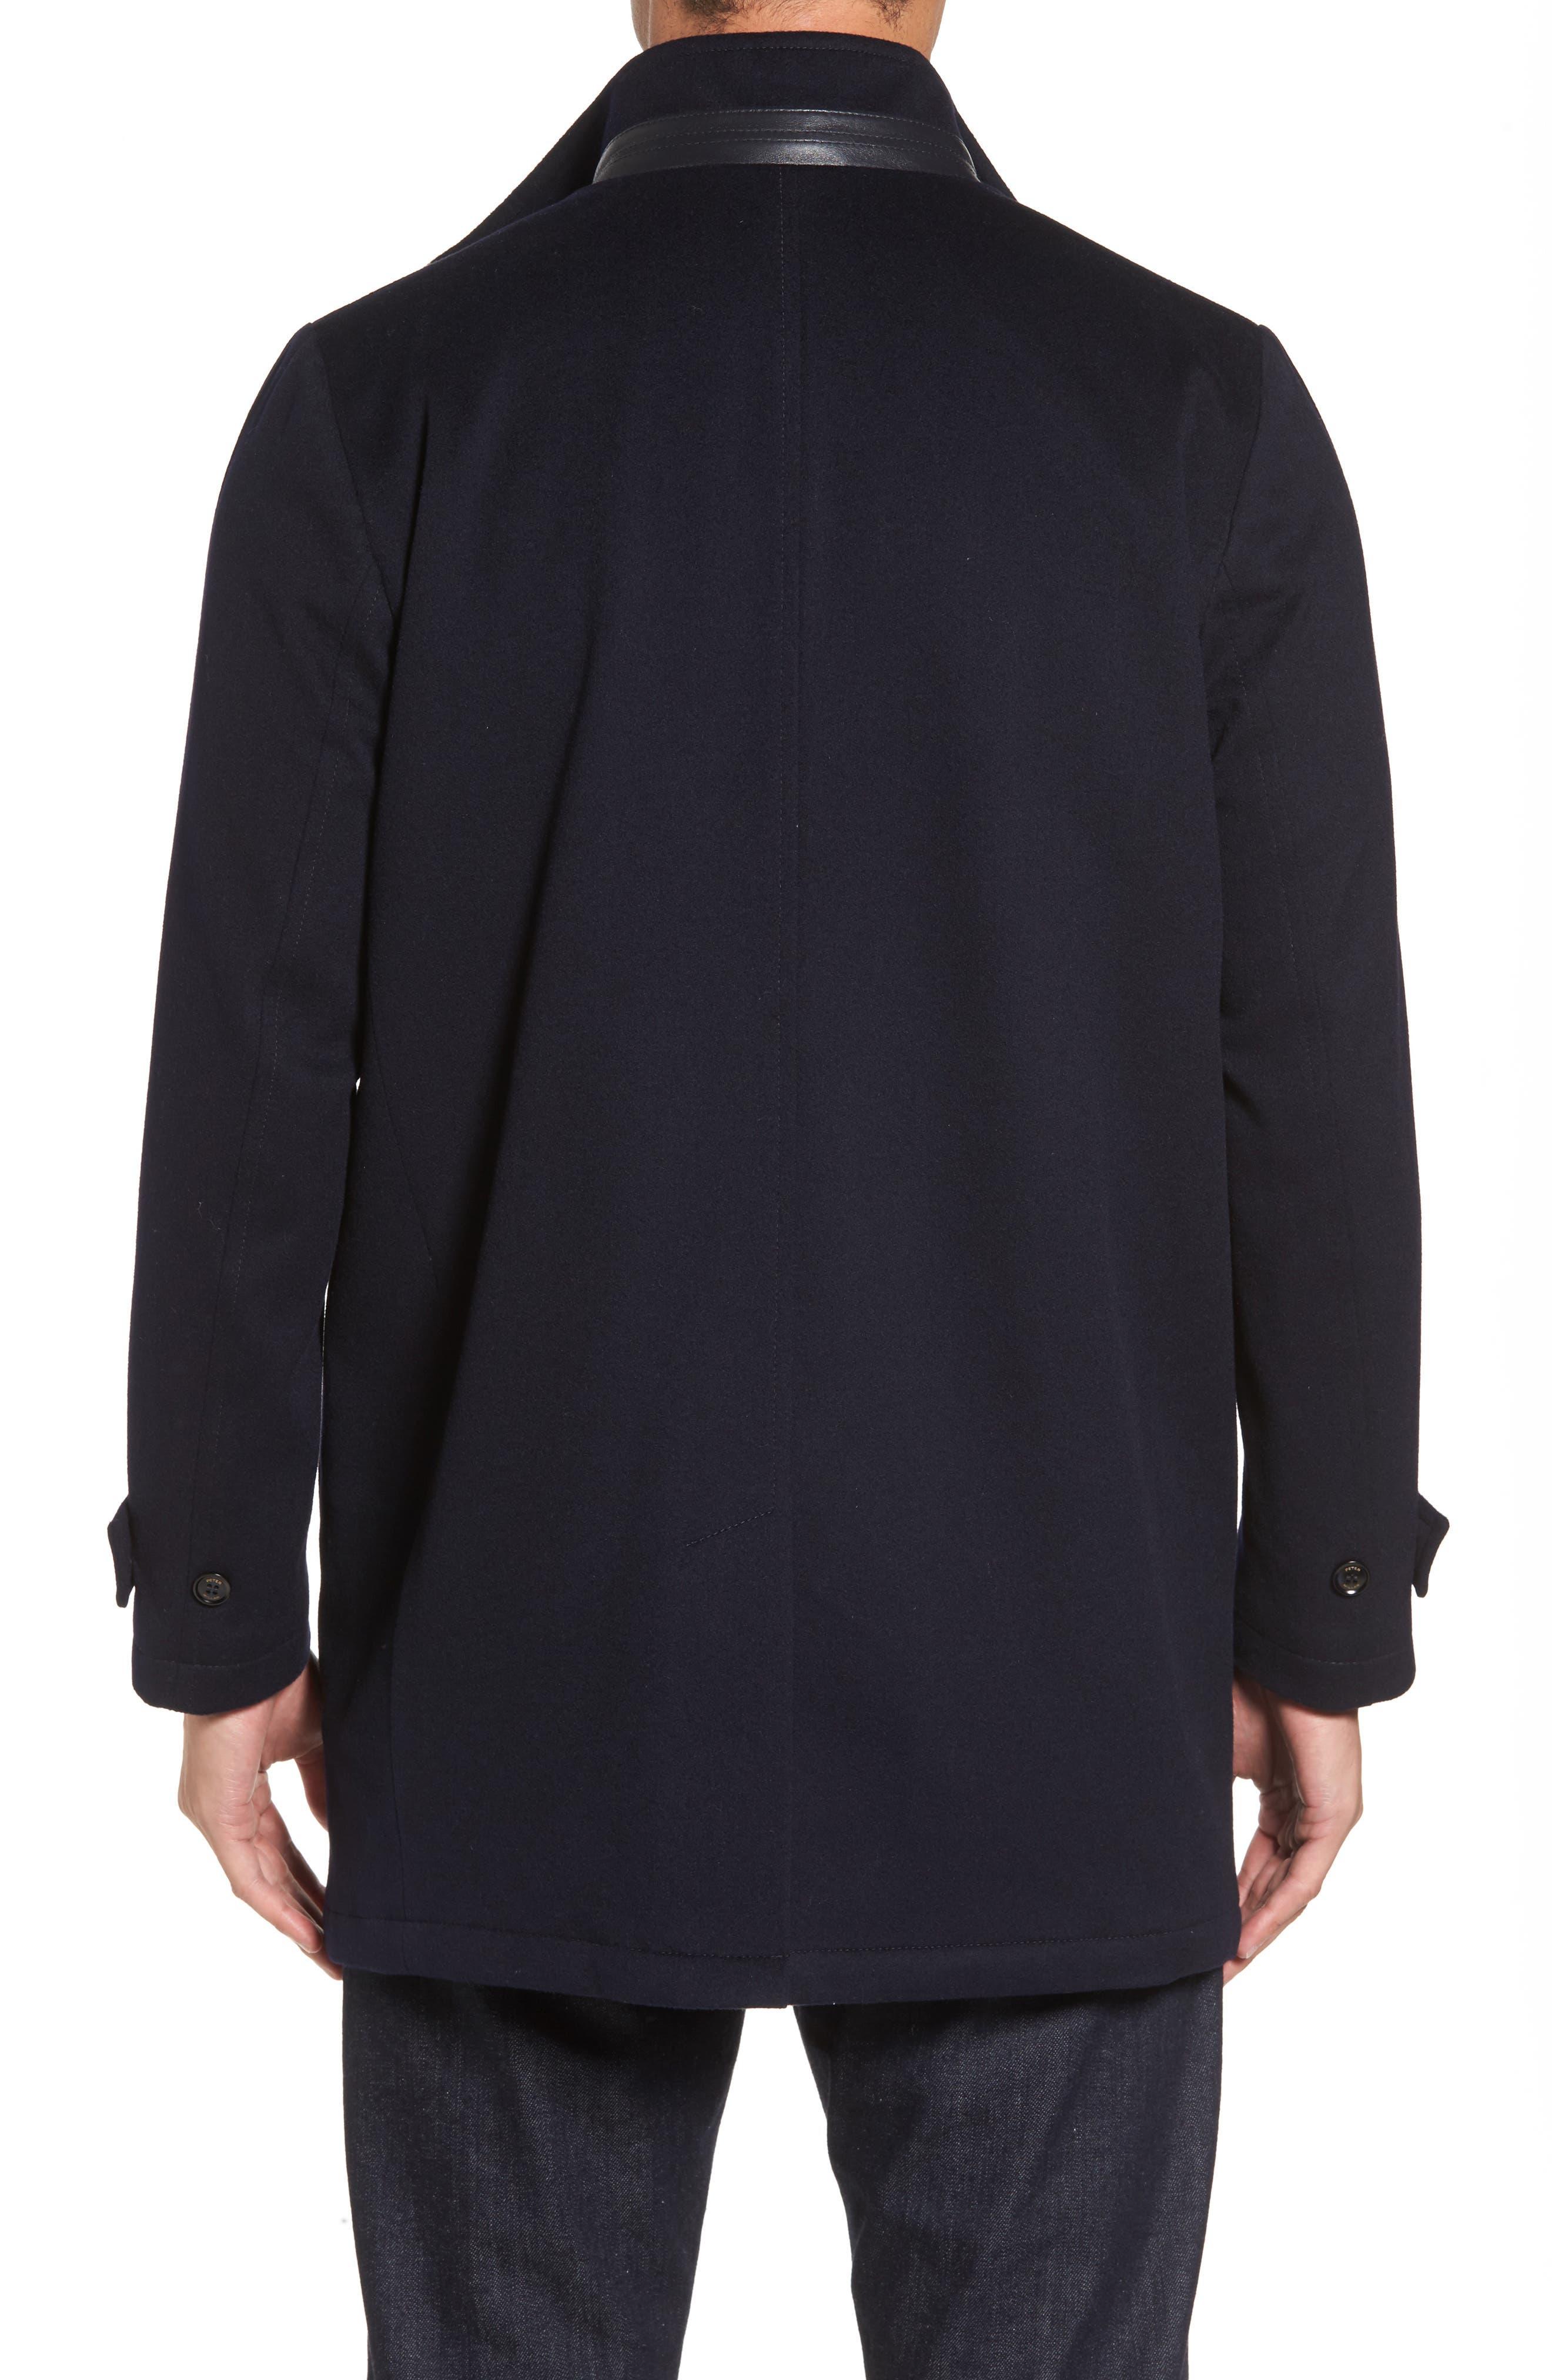 Peter Millar Horizon Wool Overcoat,                             Alternate thumbnail 3, color,                             Black